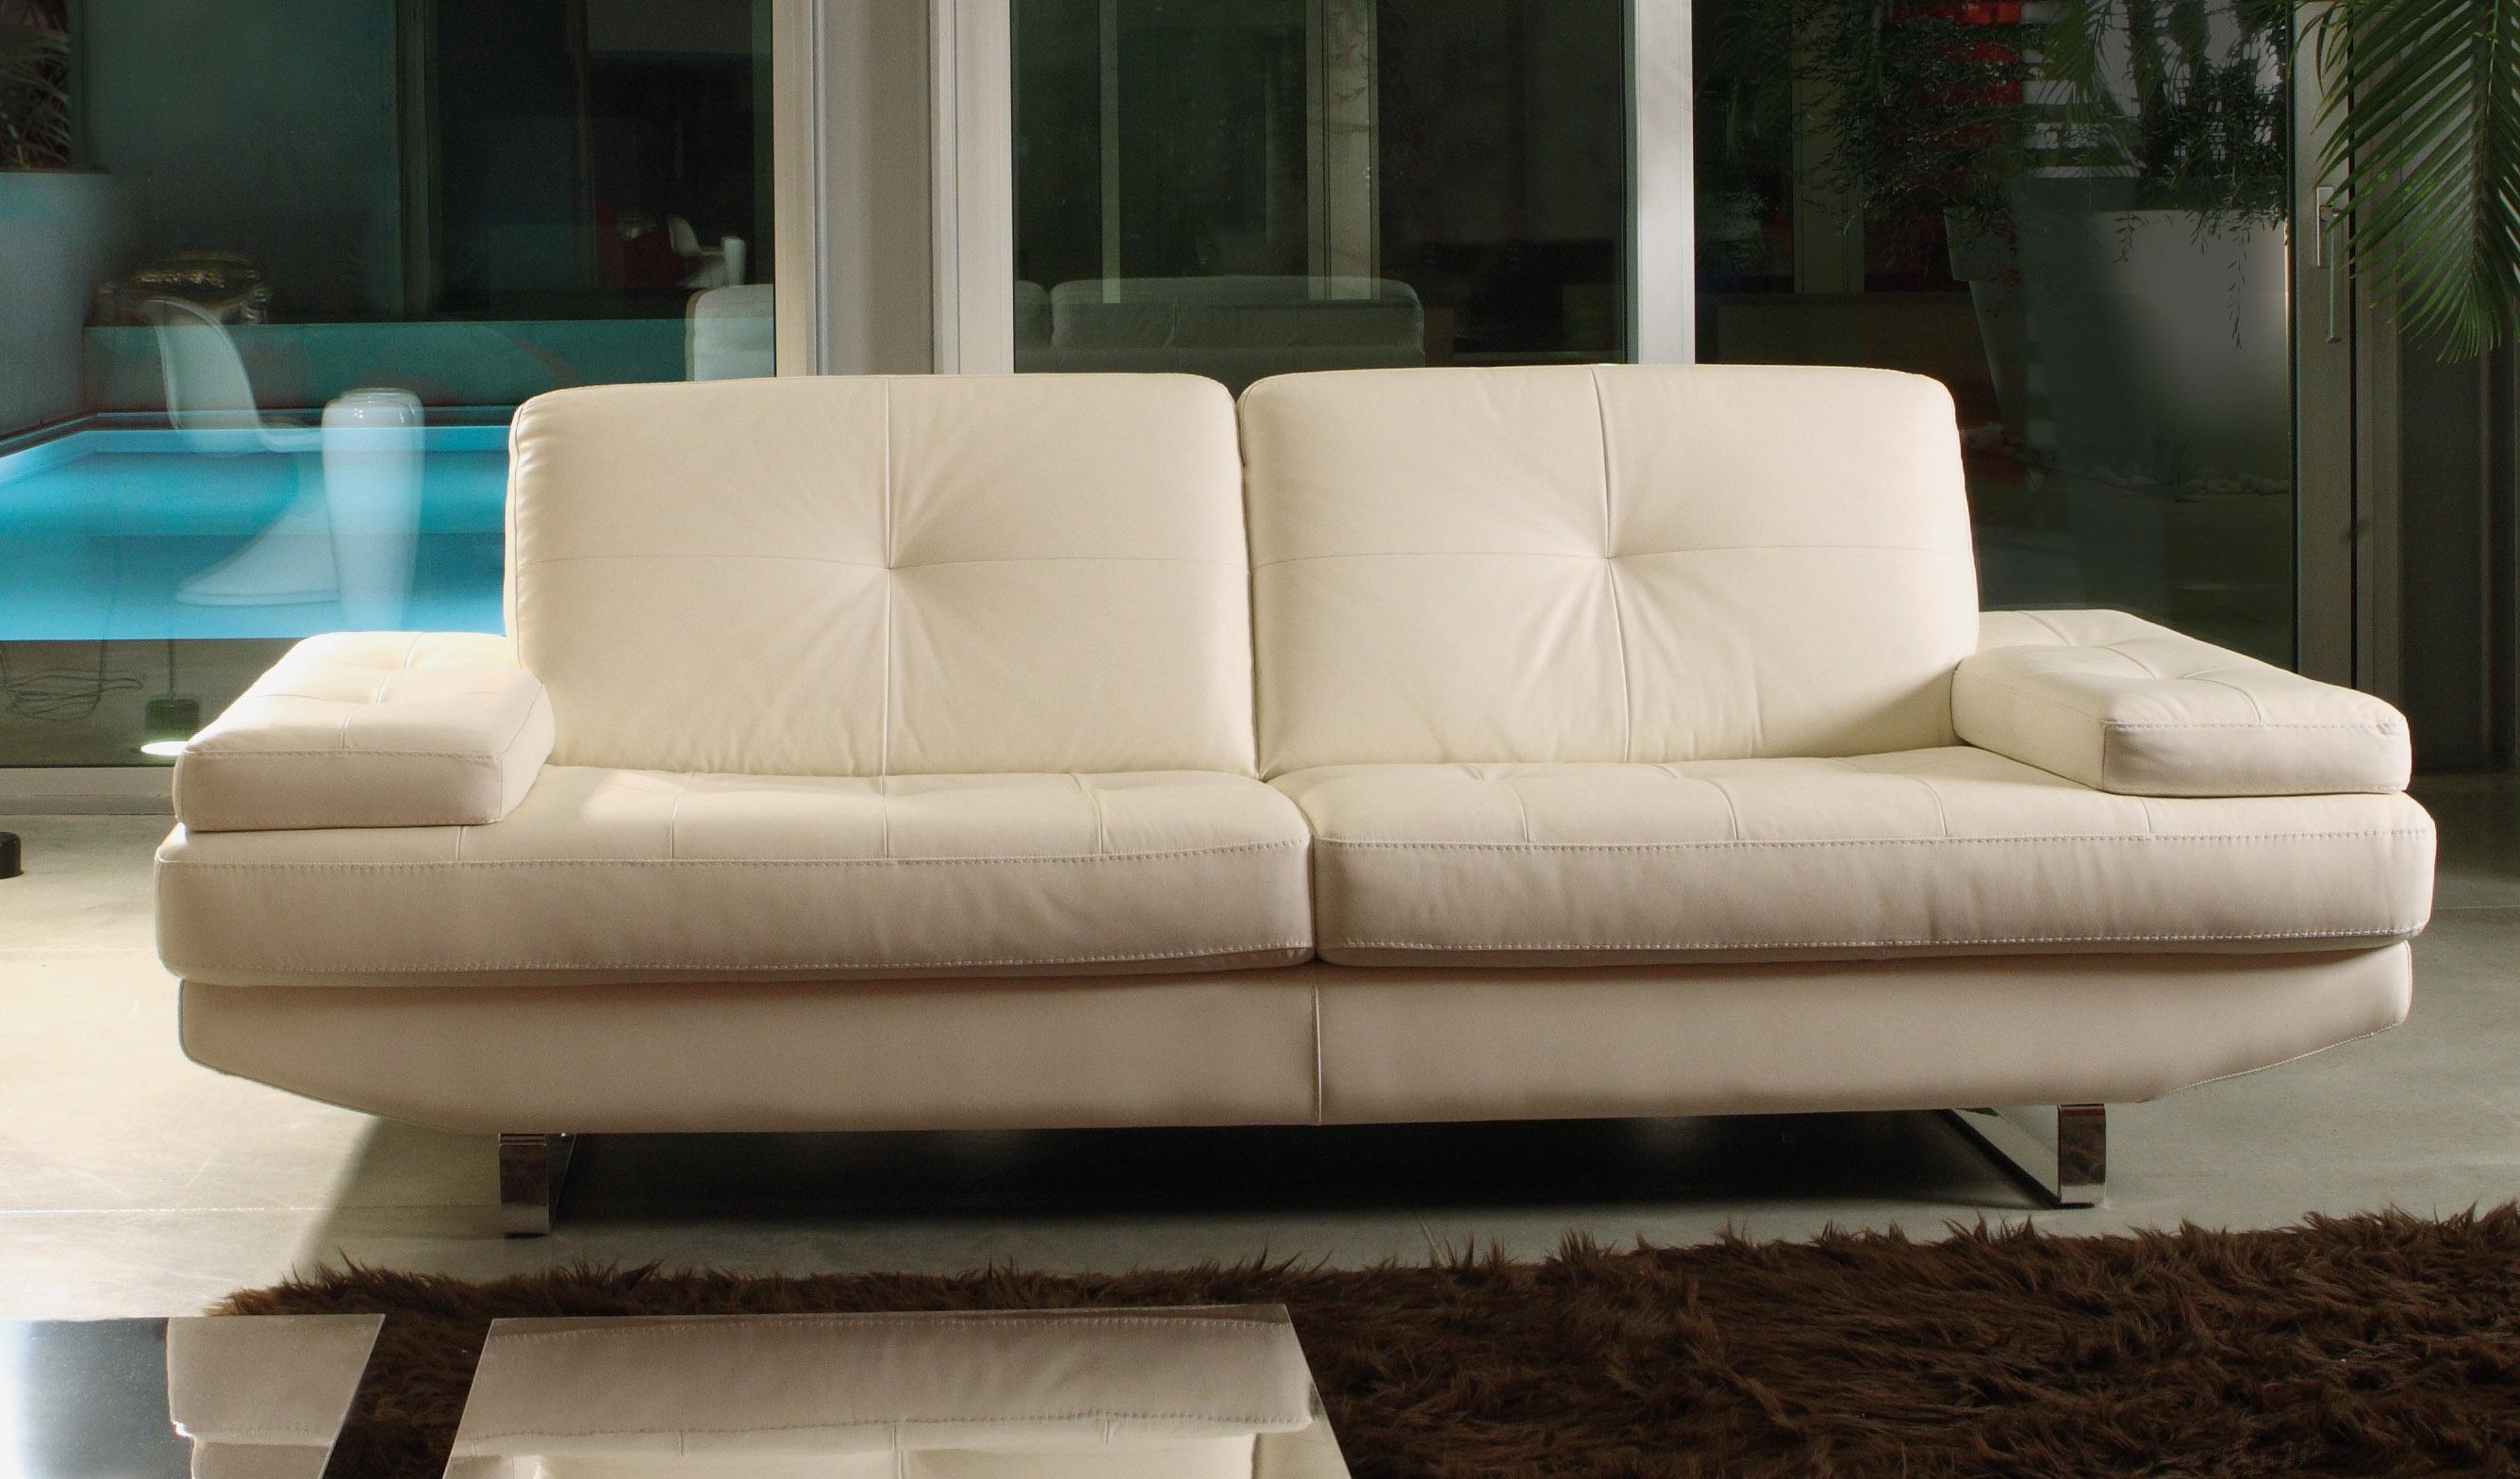 off white sofa sets istikbal regata bed sylish cream italian leather 2 pieced living room set